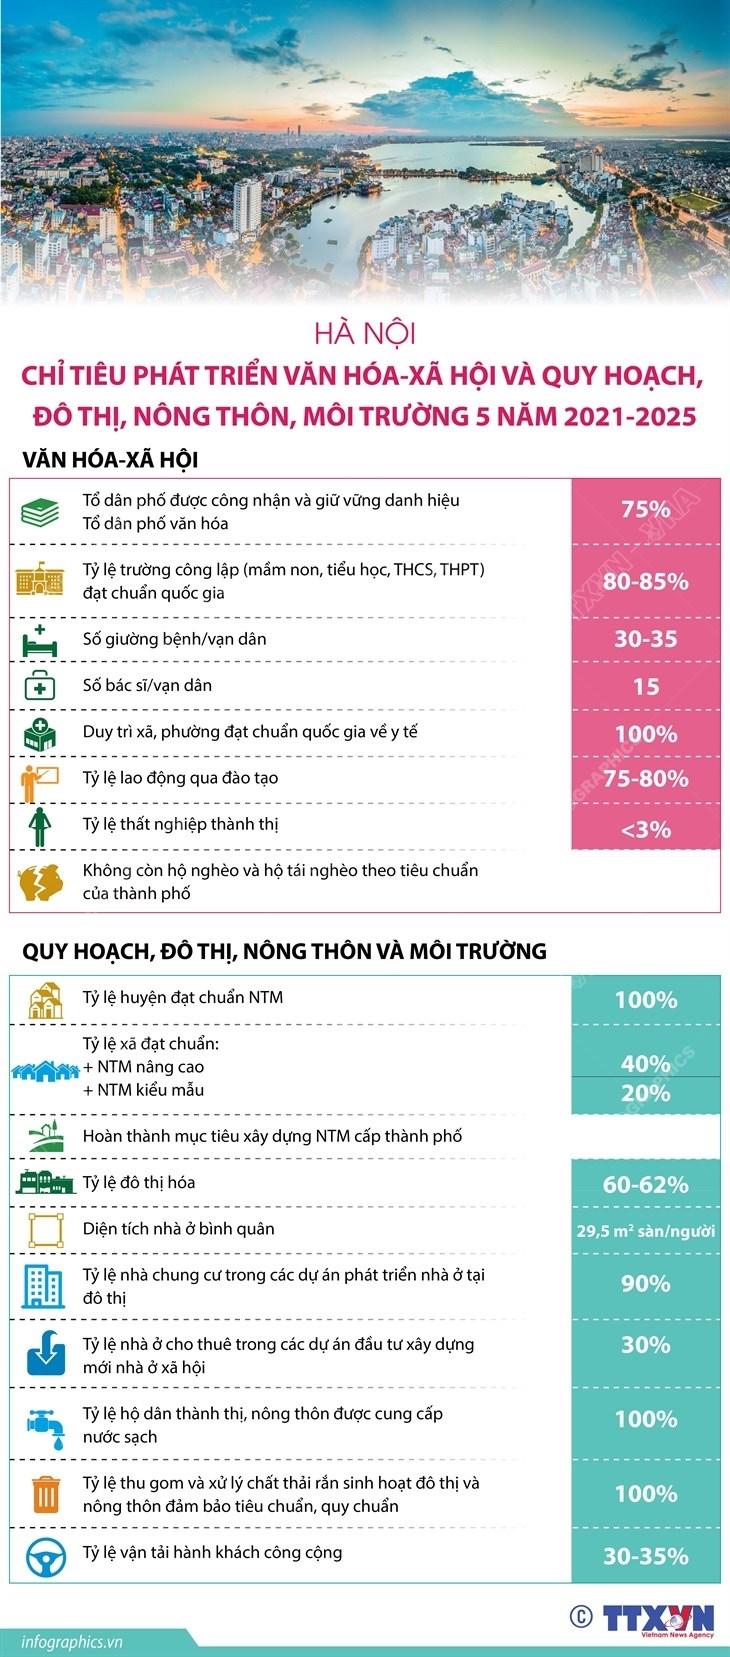 Ha Noi: Chi tieu phat trien van hoa-xa hoi giai doan 2021-2025 hinh anh 1